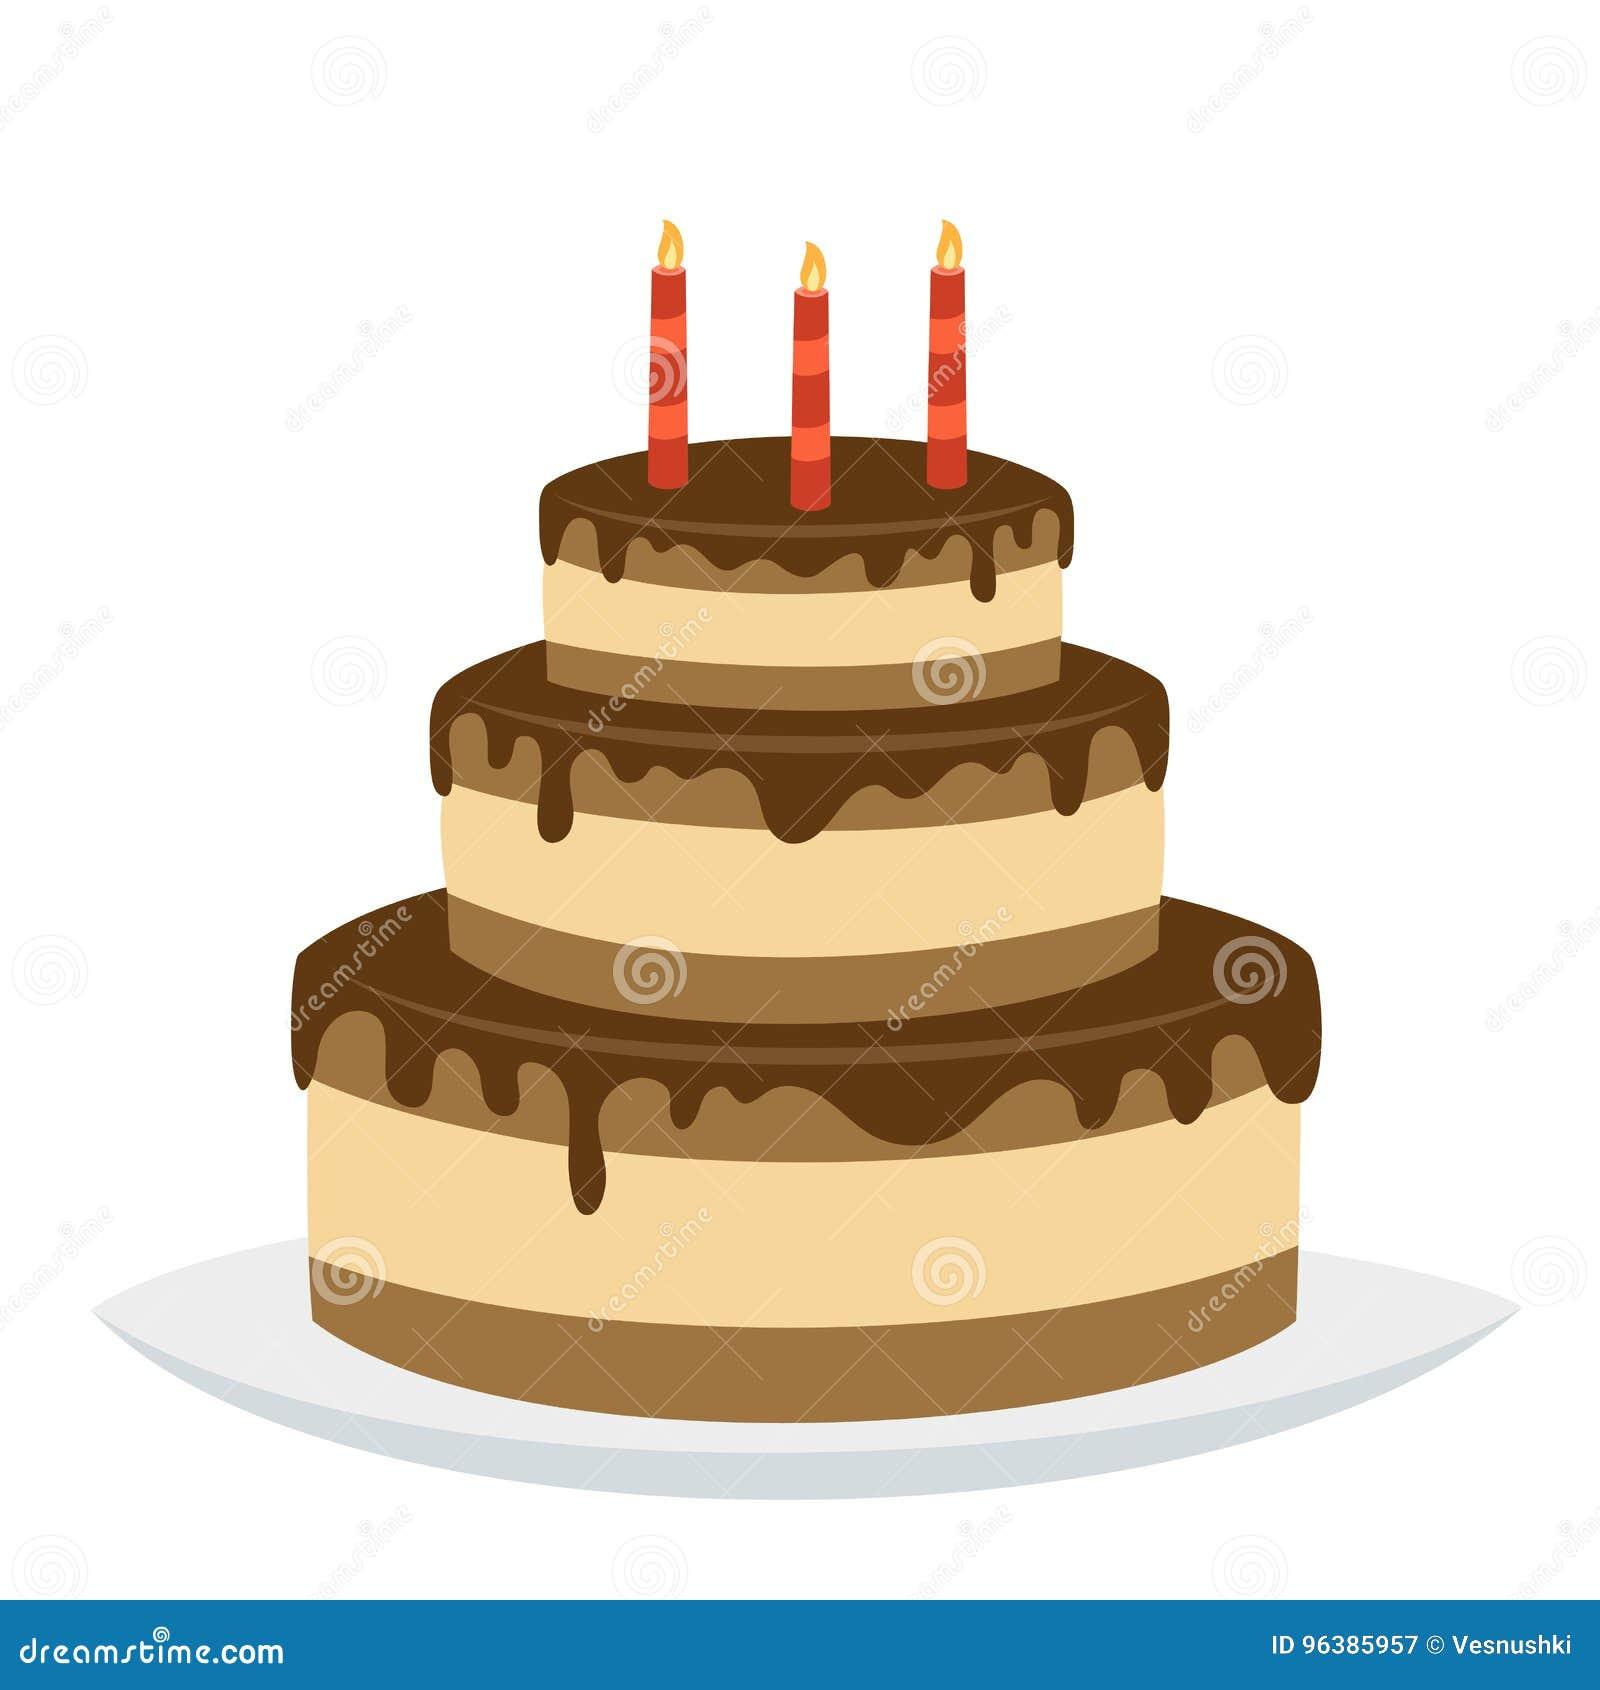 delicious chocolate birthday cake with happy birthday